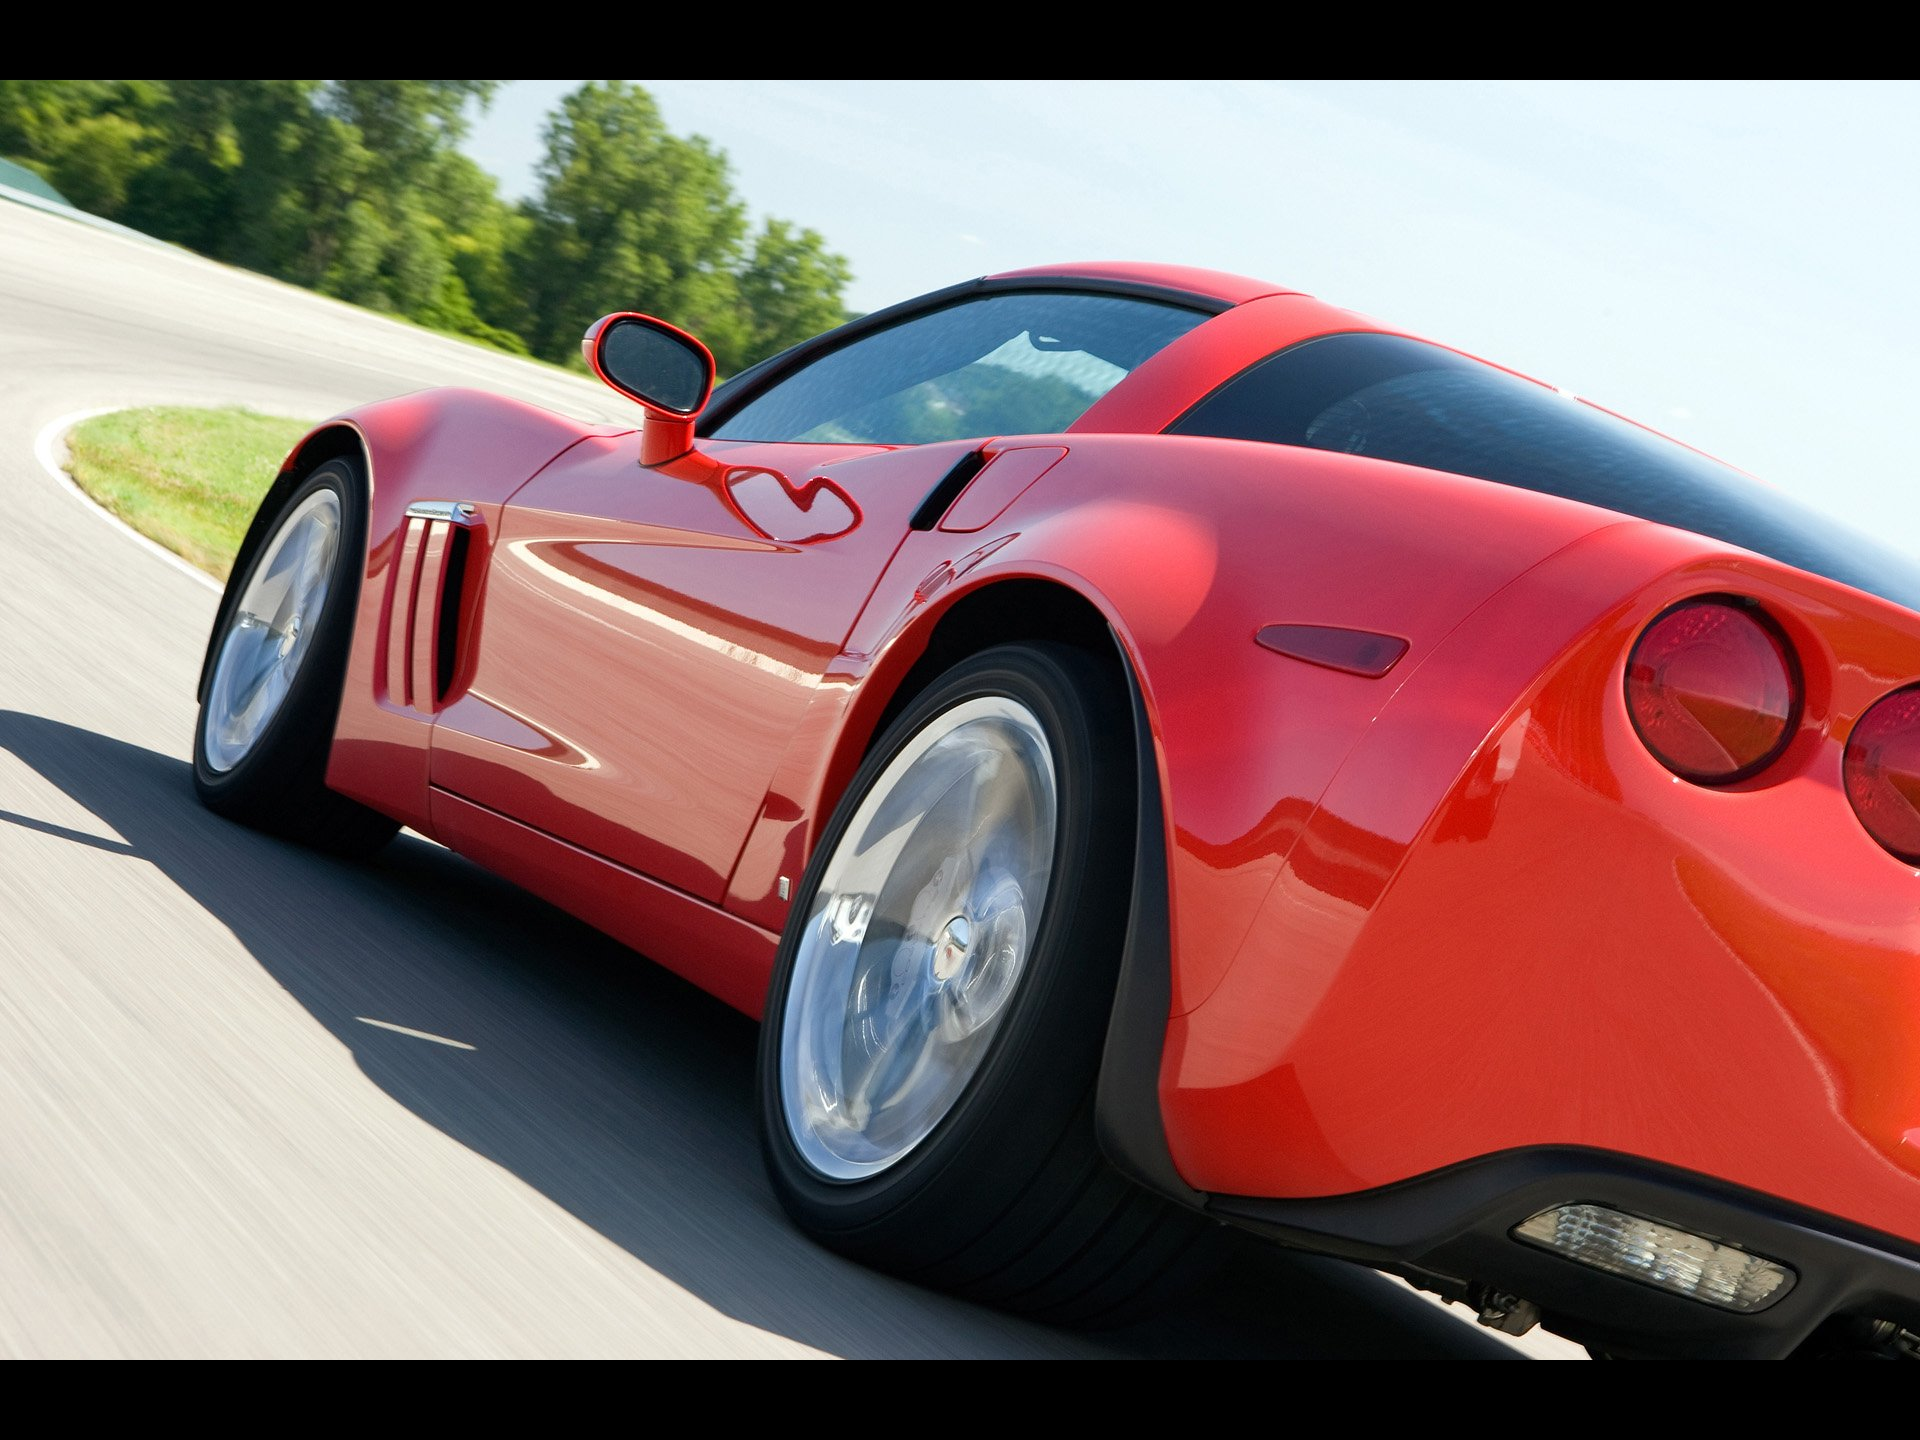 Corvette Grand Sport Iphone Wallpaper